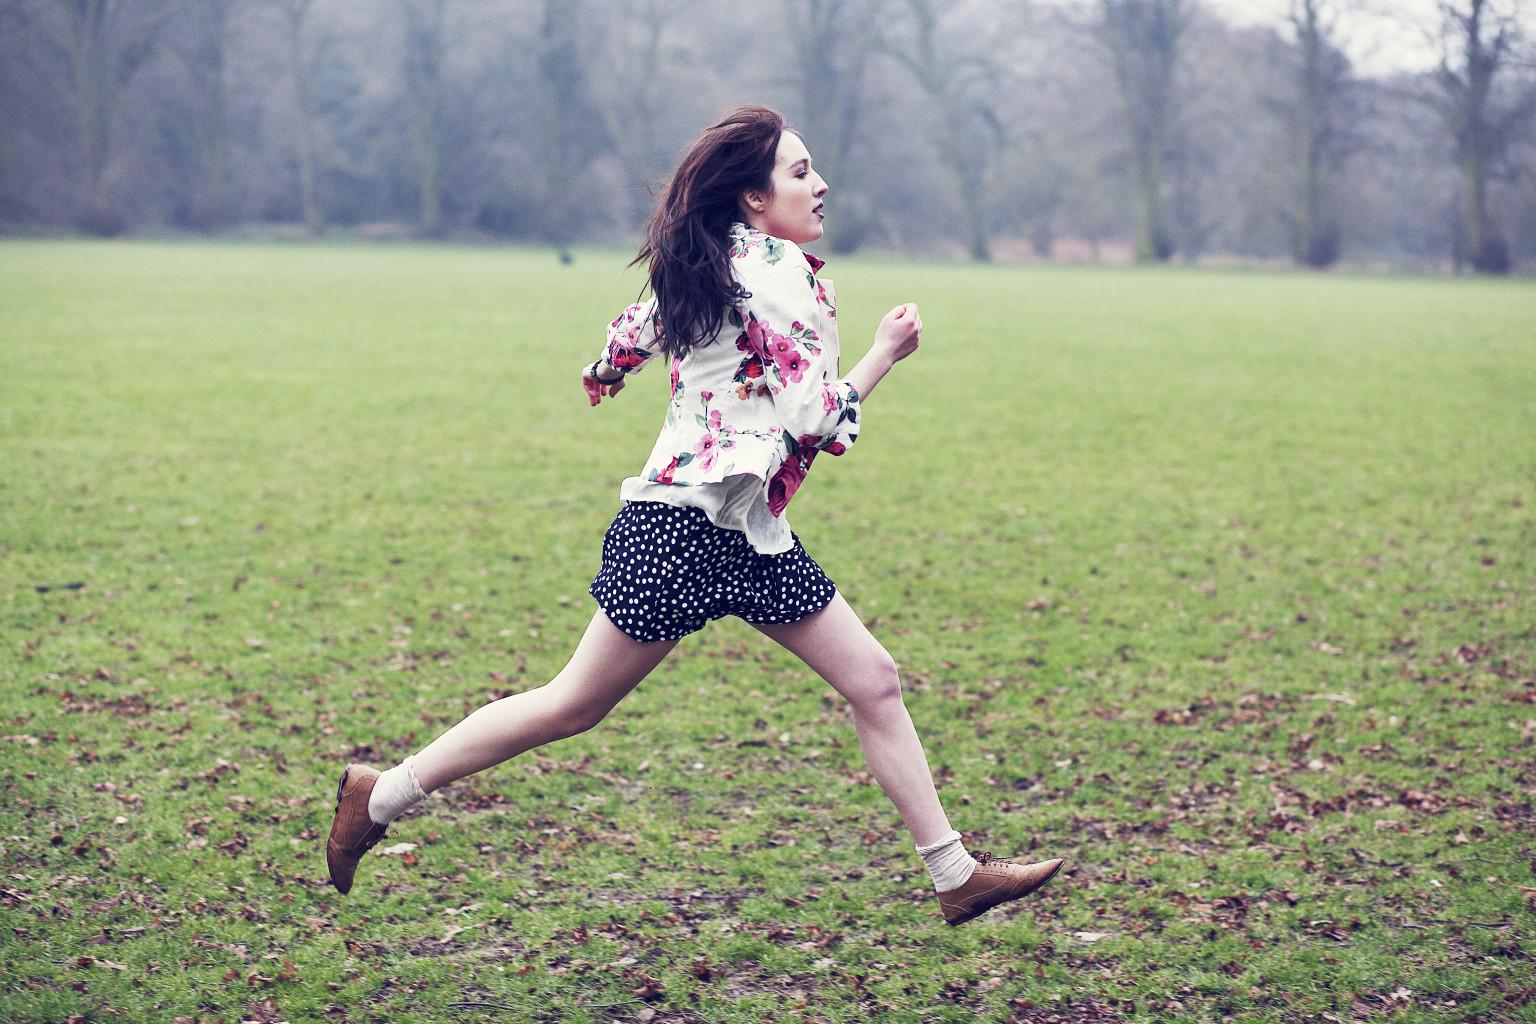 Project Marathon Girl